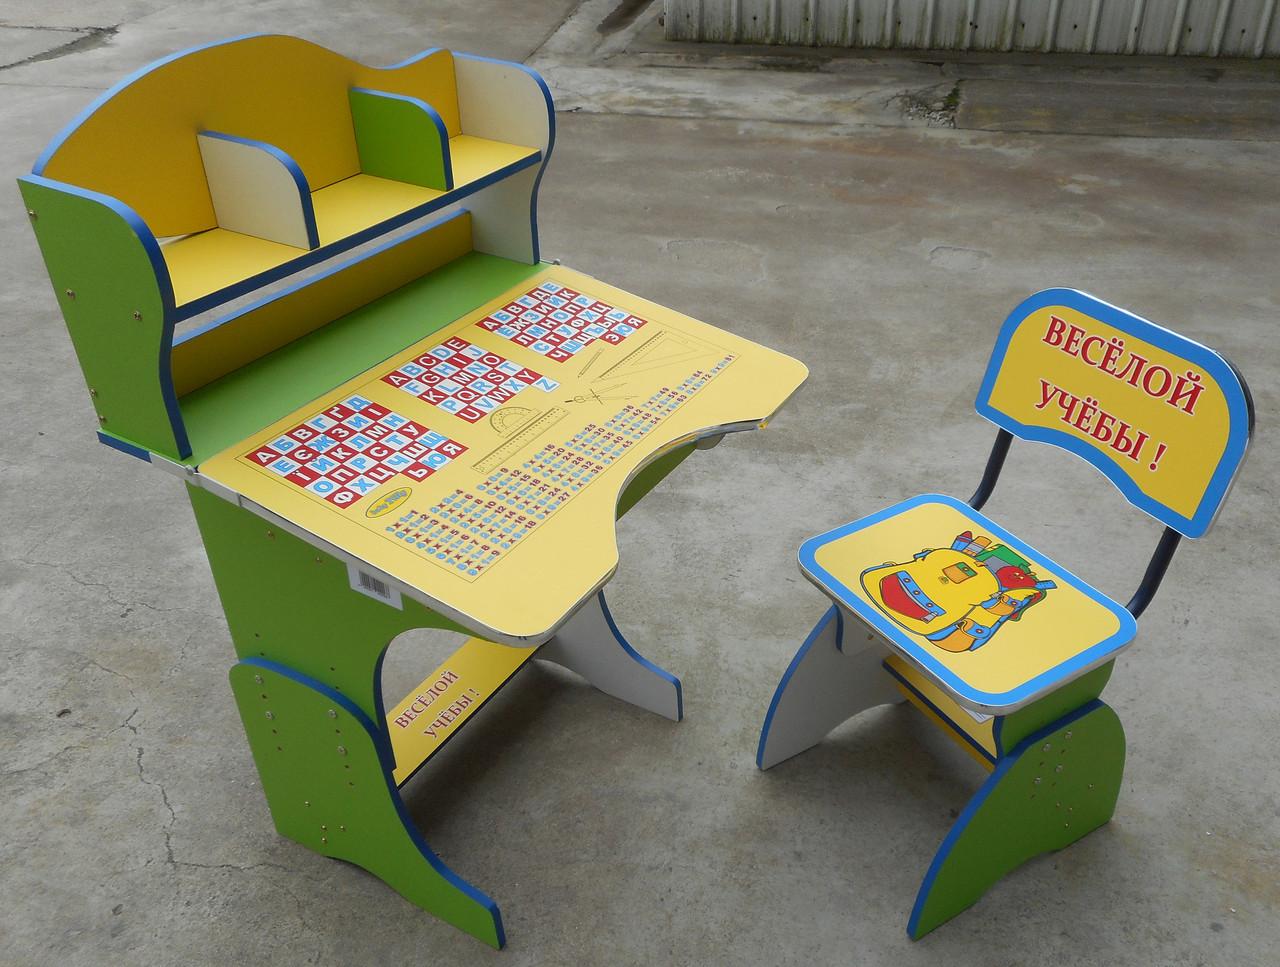 Парта + стул E2878 YELLOW-GREEN Веселой учебы